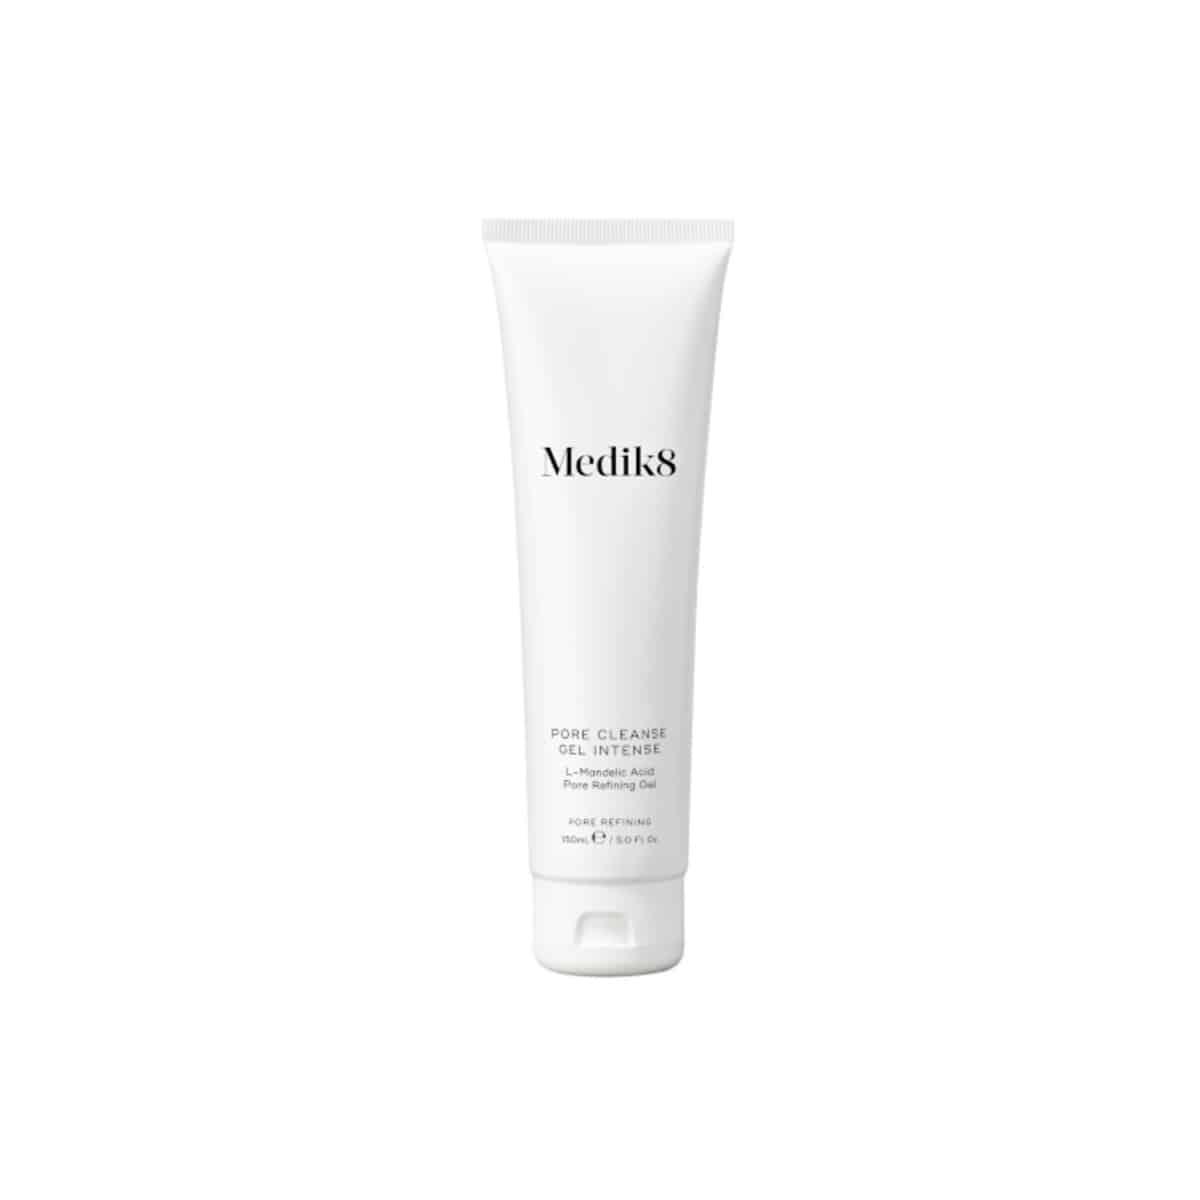 Medik8 Pore Cleanse Gel Ireland